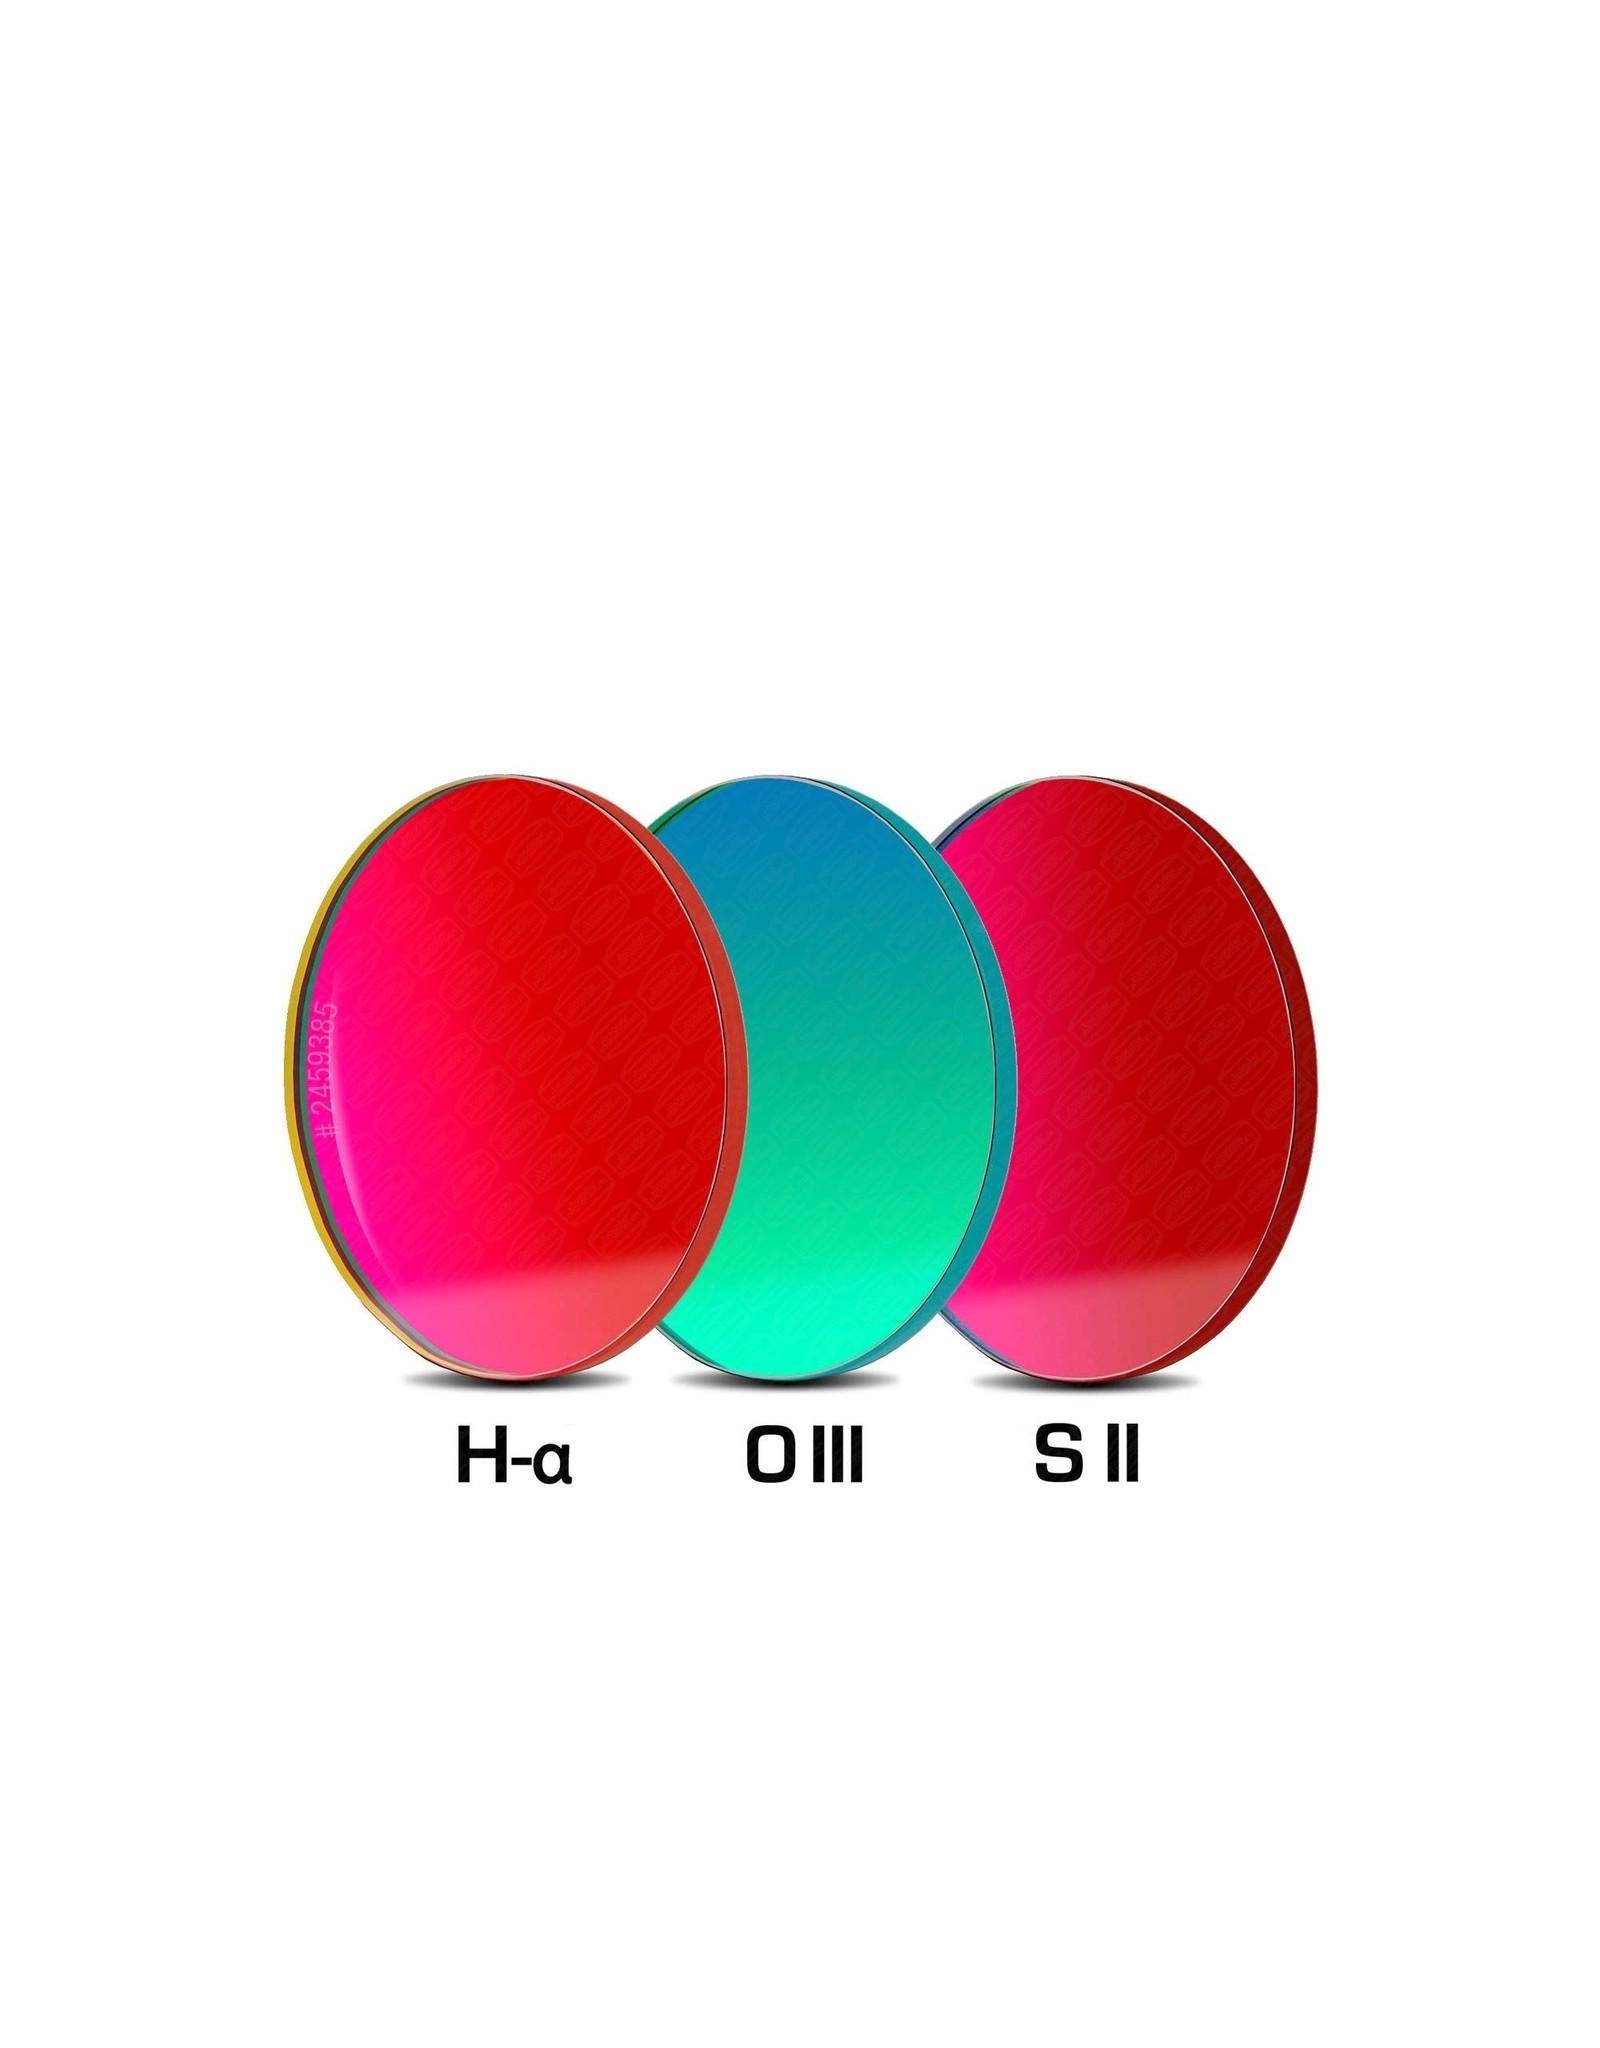 Baader Planetarium Baader f/2 Highspeed-Filterset H-alpha / OIII / SII (Specify Size)